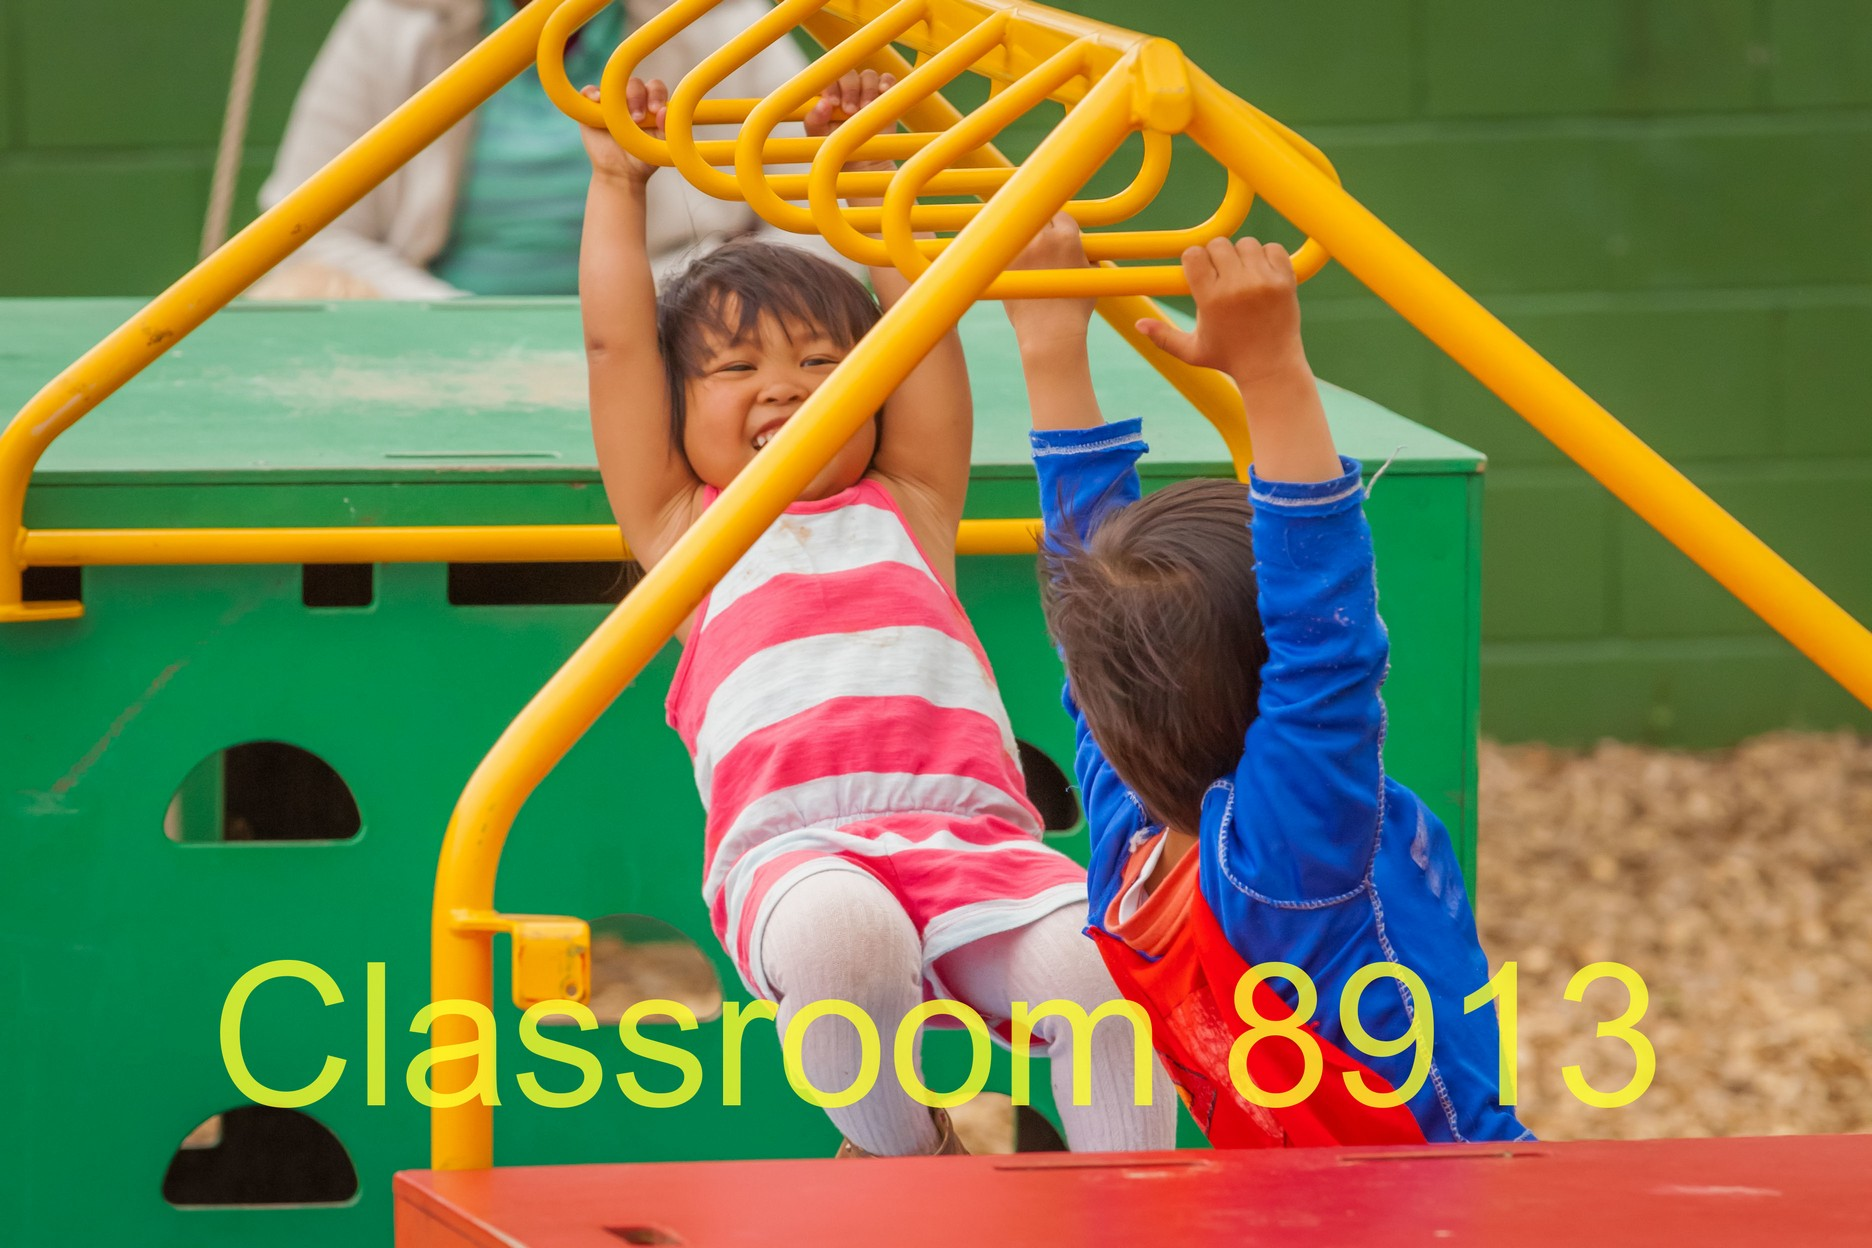 Classroom 8913